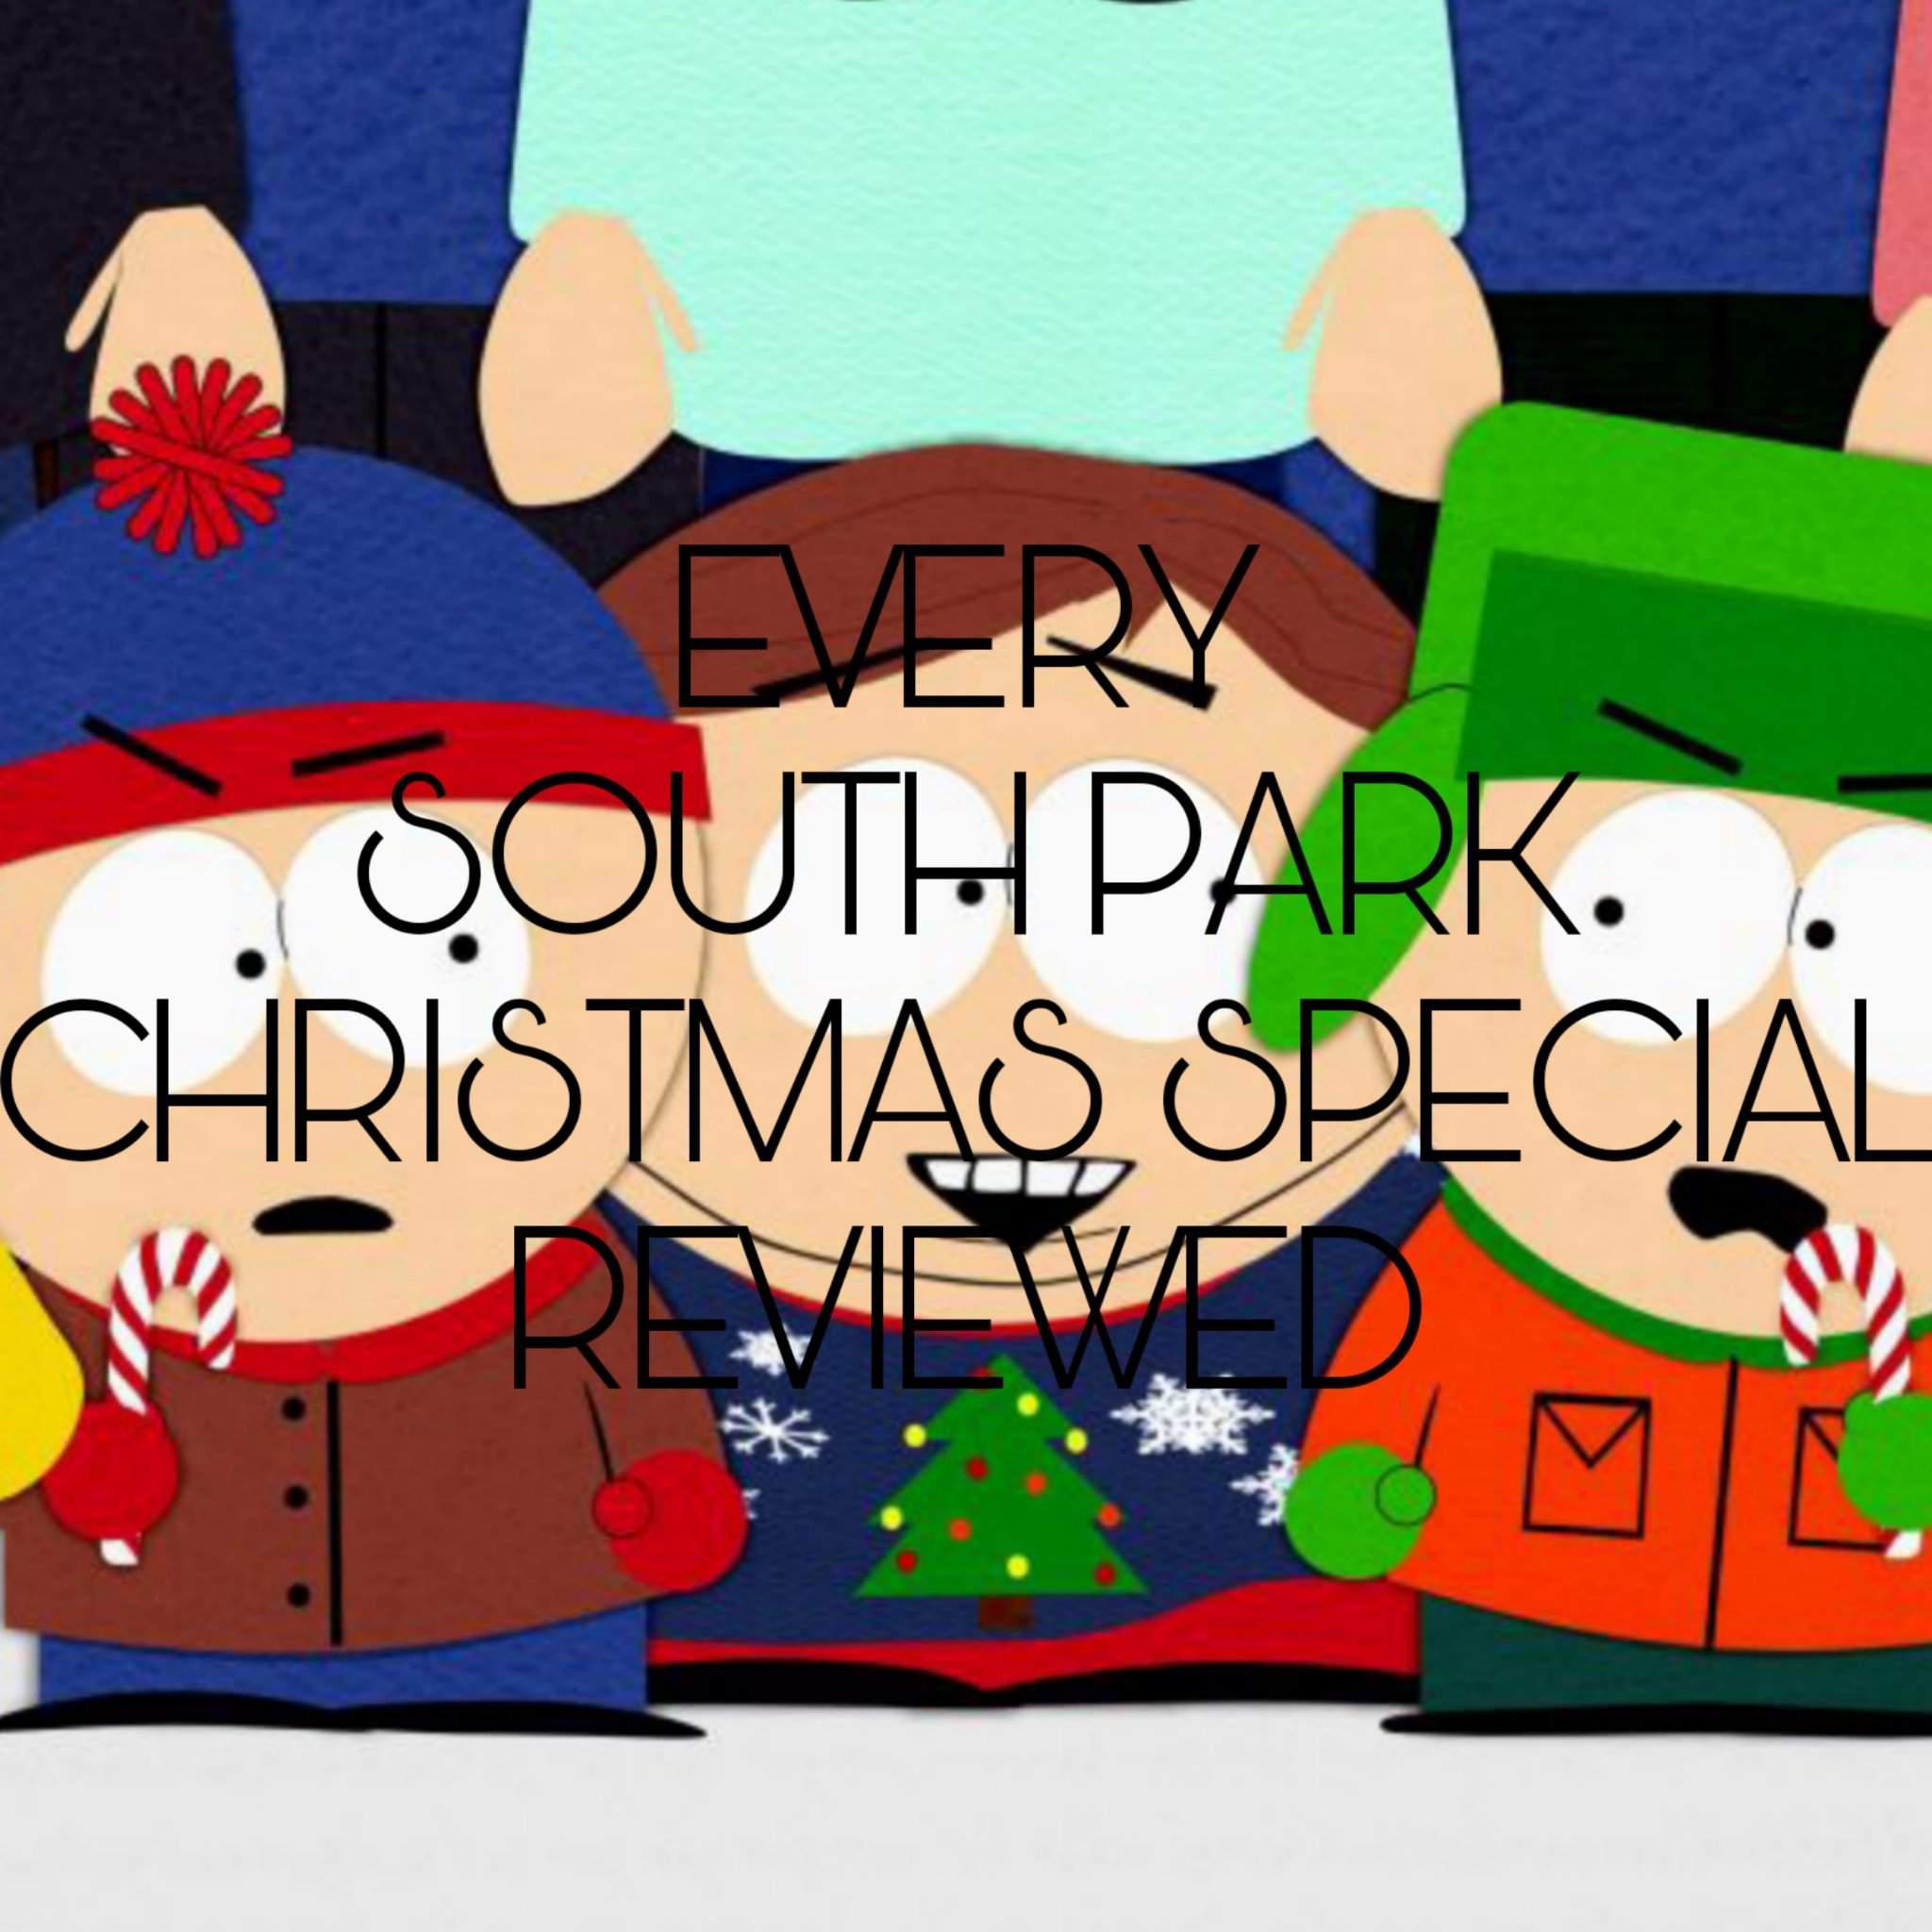 Every South Park Christmas Special Reviewed | Cartoon Amino